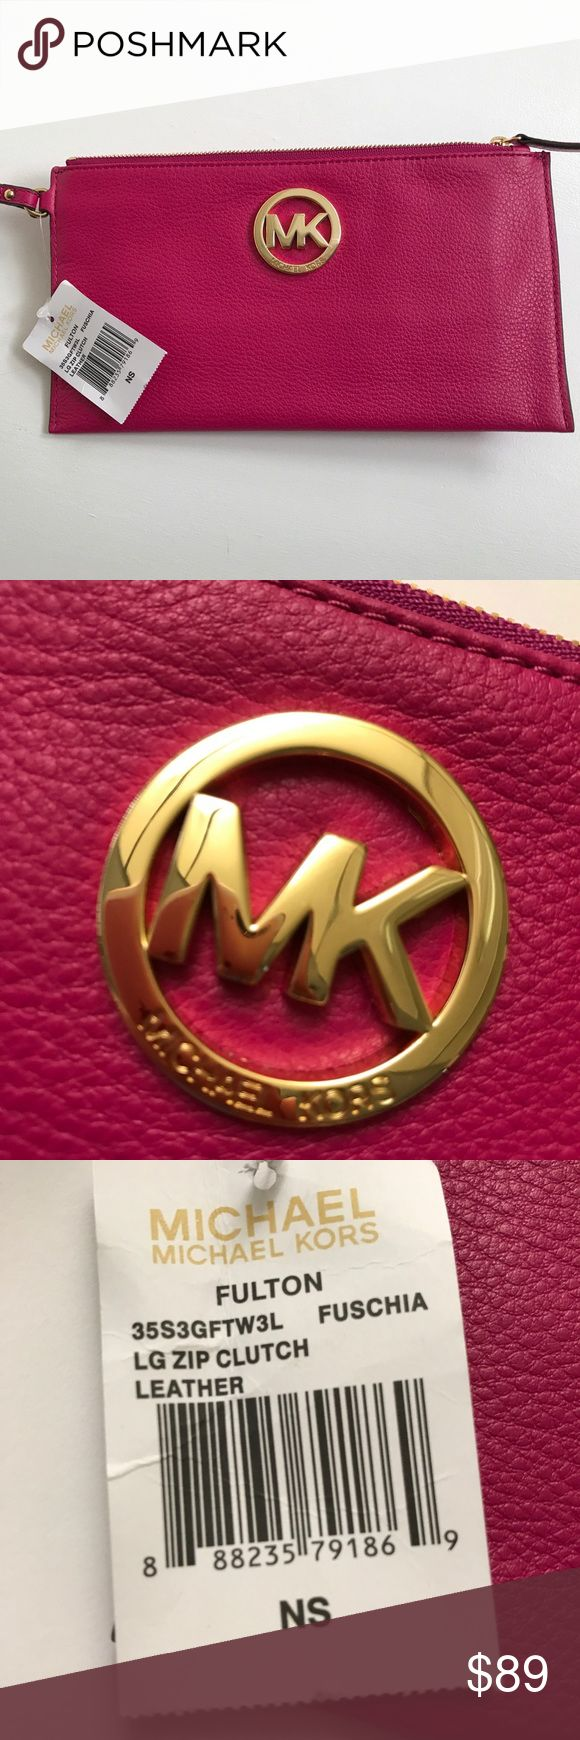 🆕 MK Fulton Leather Wristlet Clutch Authentic Michael Kors large clutch/wristlet.  Six cc slots, inside pocket.  Beautiful soft pebble leather in bright fuchsia! Michael Kors Bags Clutches & Wristlets